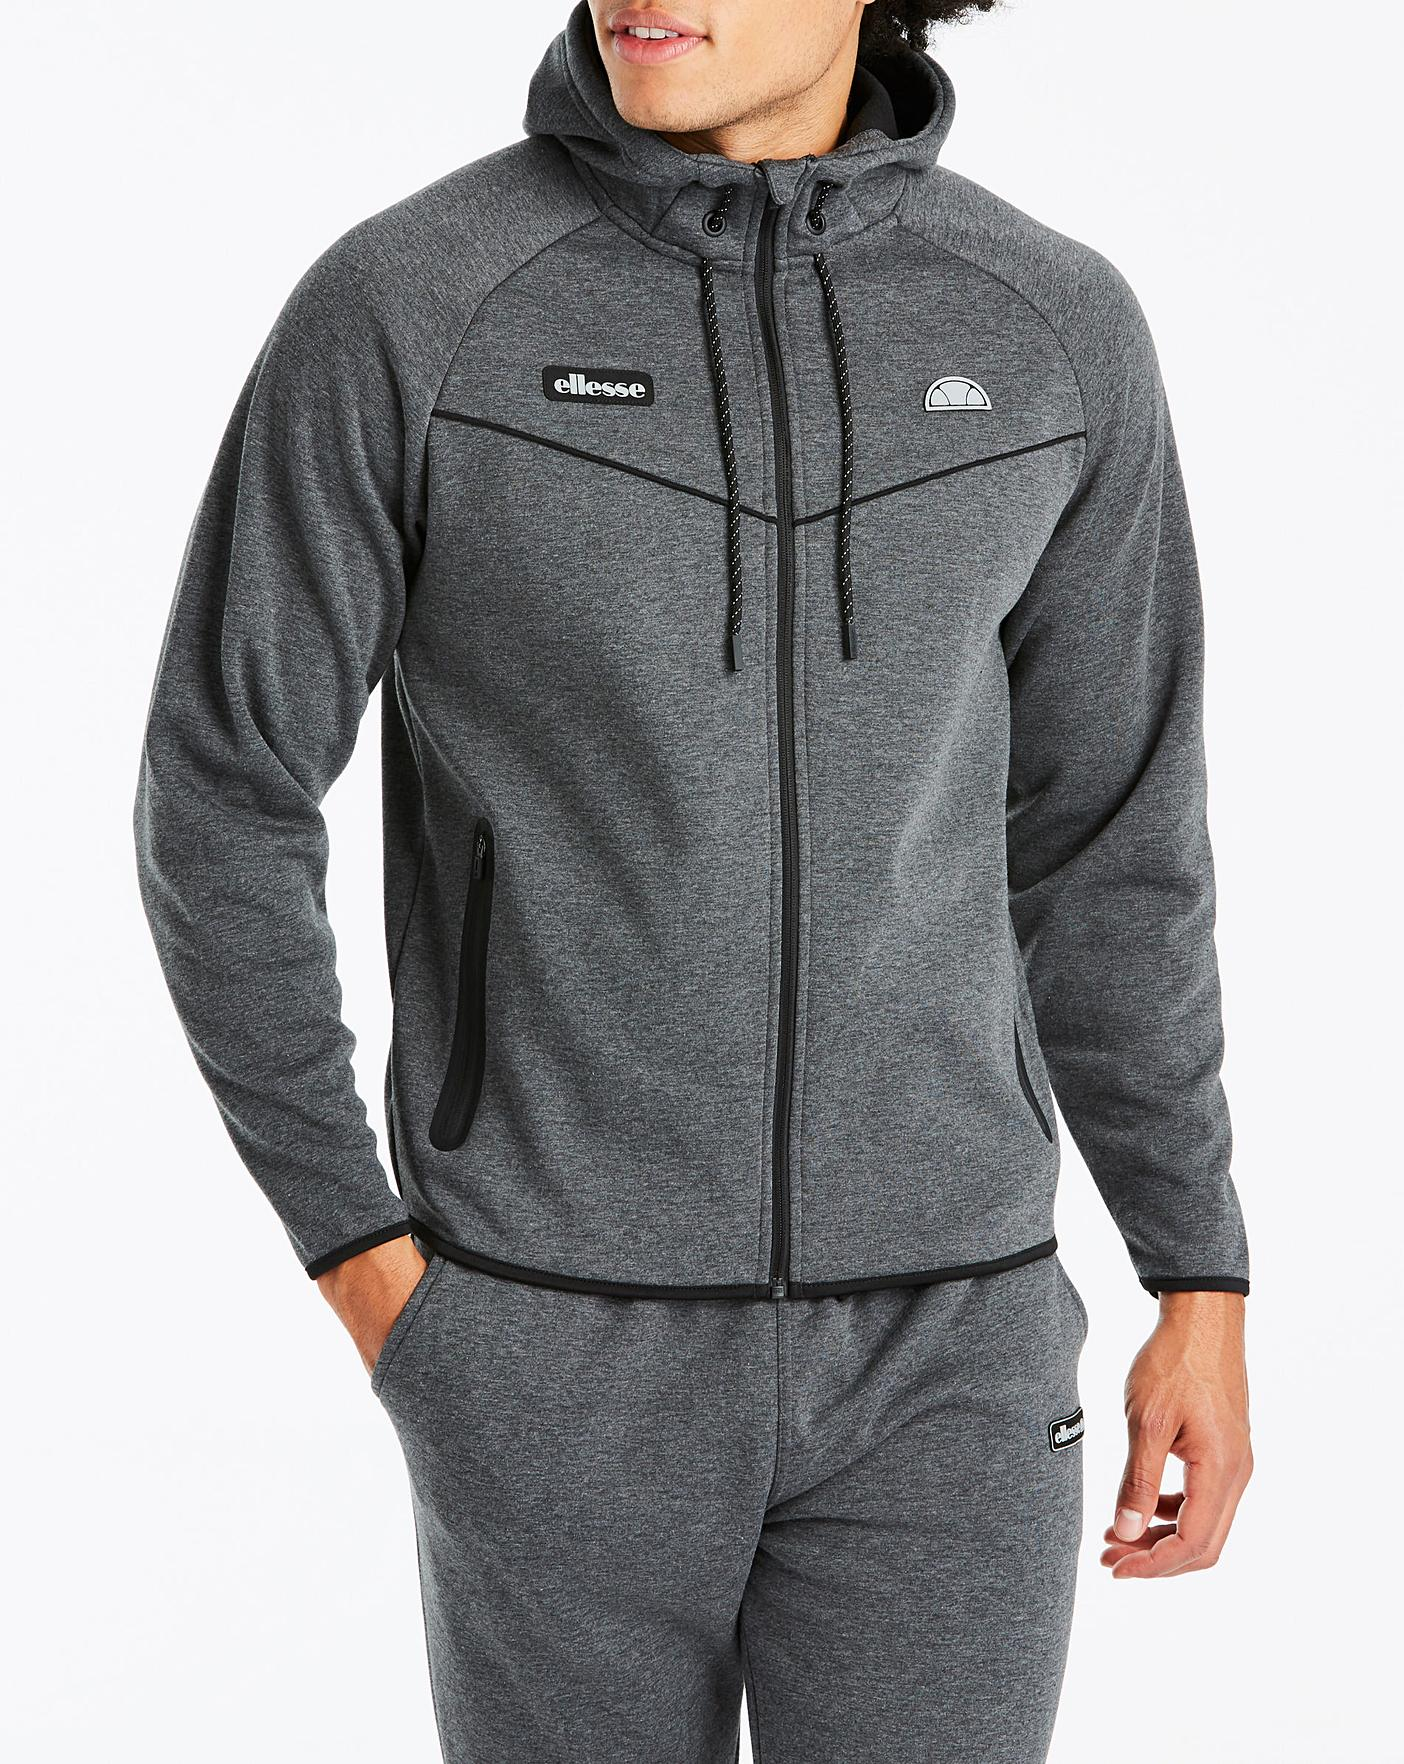 8fd9aad6 Ellesse Restaro Full Zip Hooded Jacket